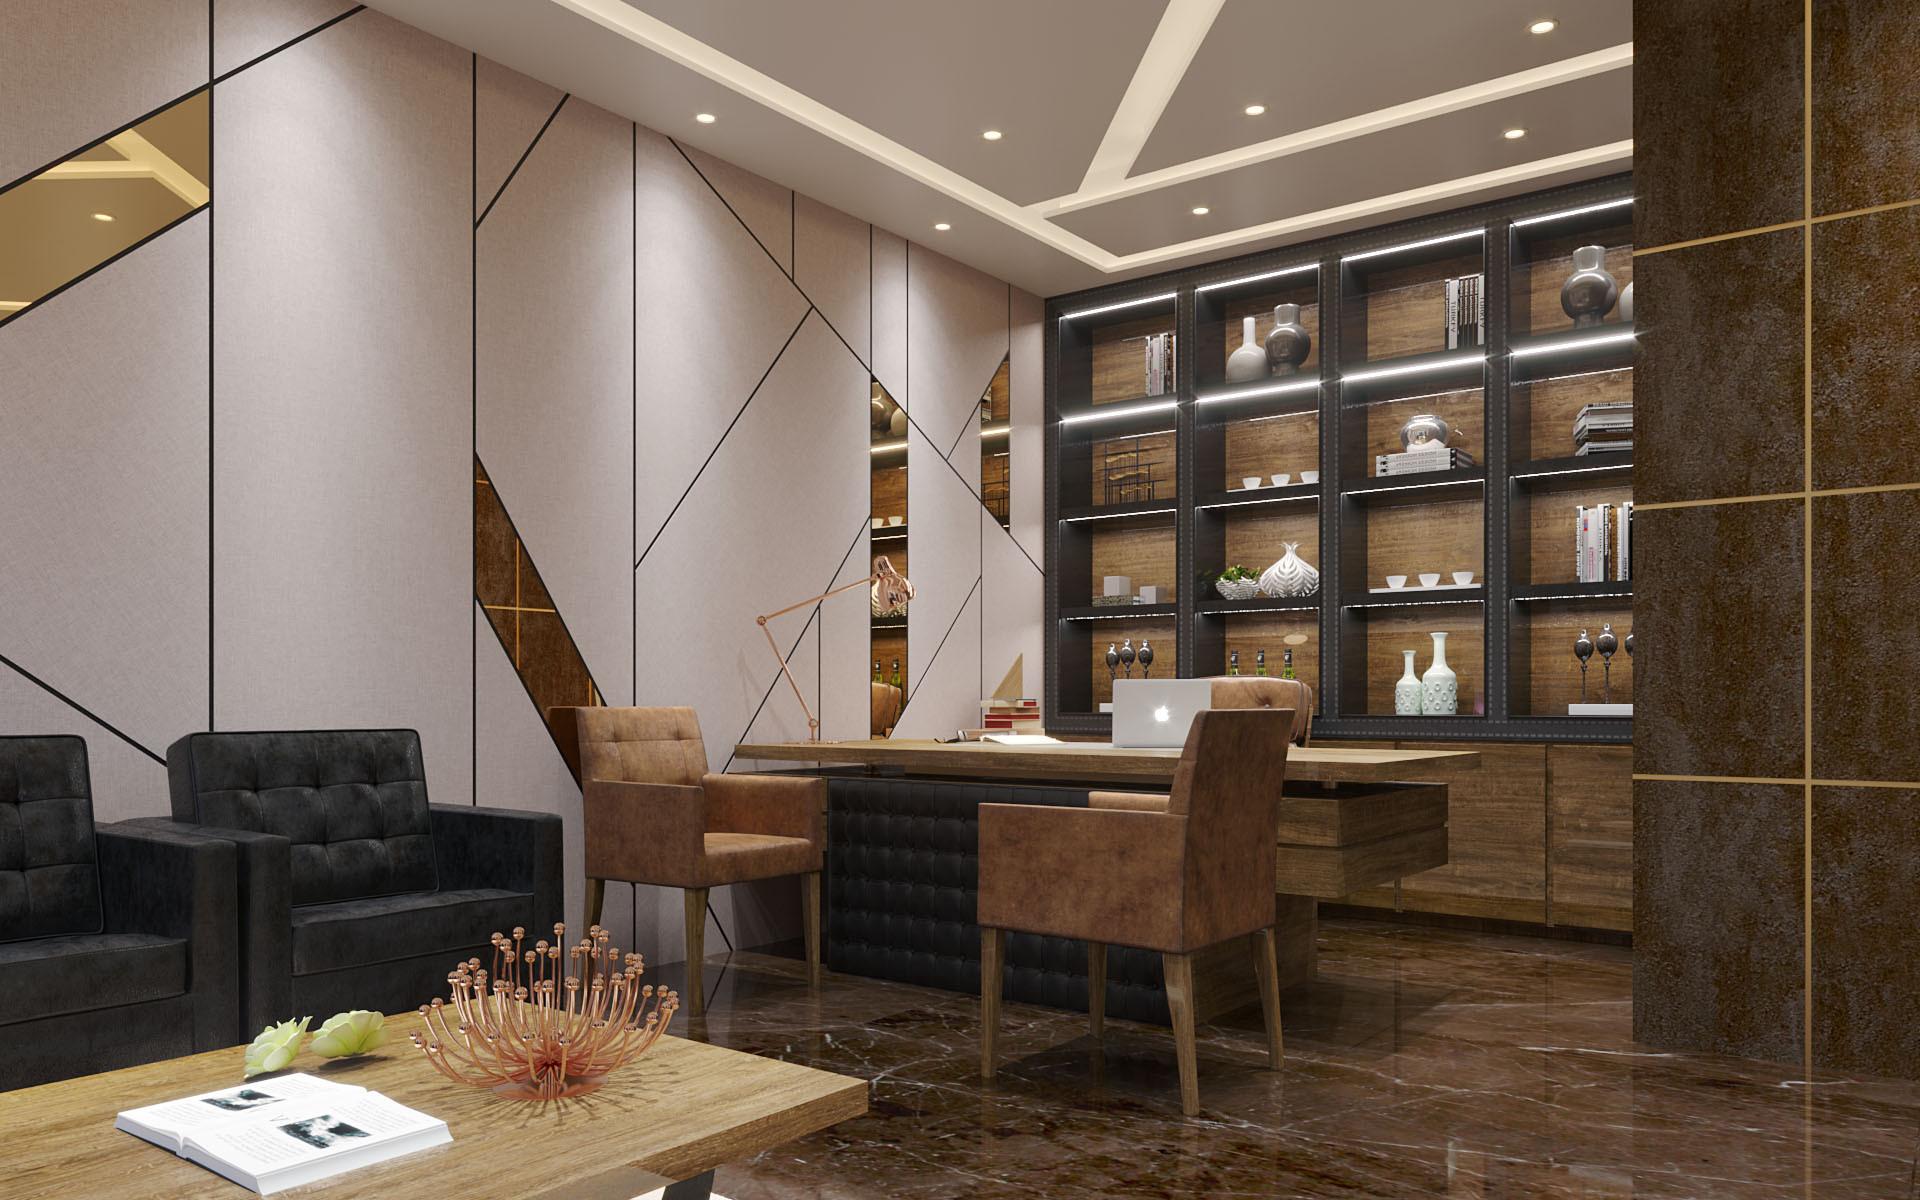 3D_renders_interiors_Villa01_1.jpg